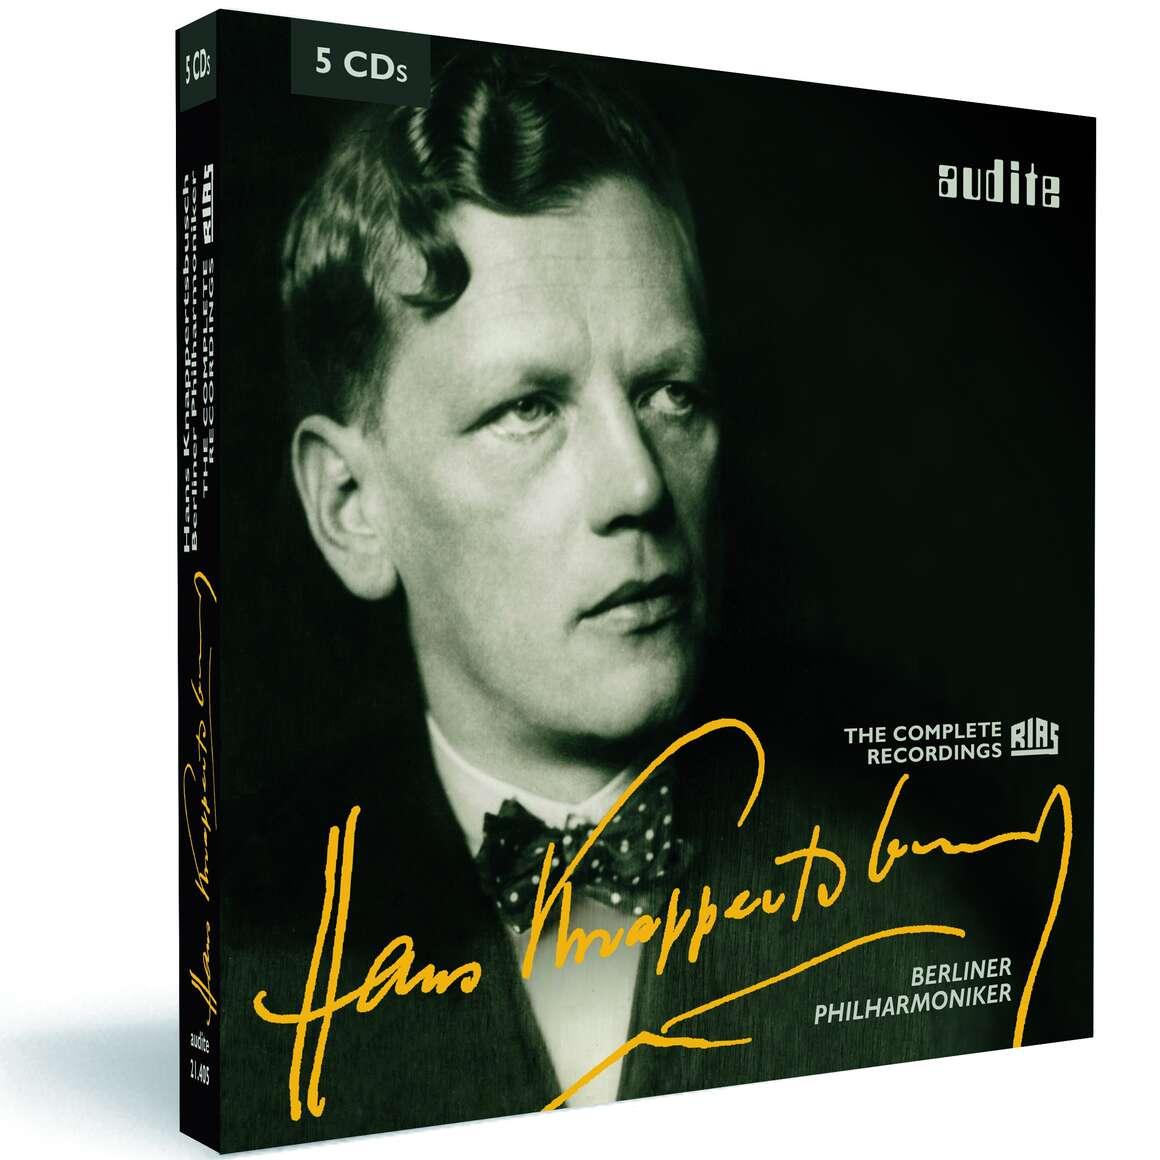 Edition Hans Knappertsbusch & Berliner Philharmoniker – The complete RIAS recordings